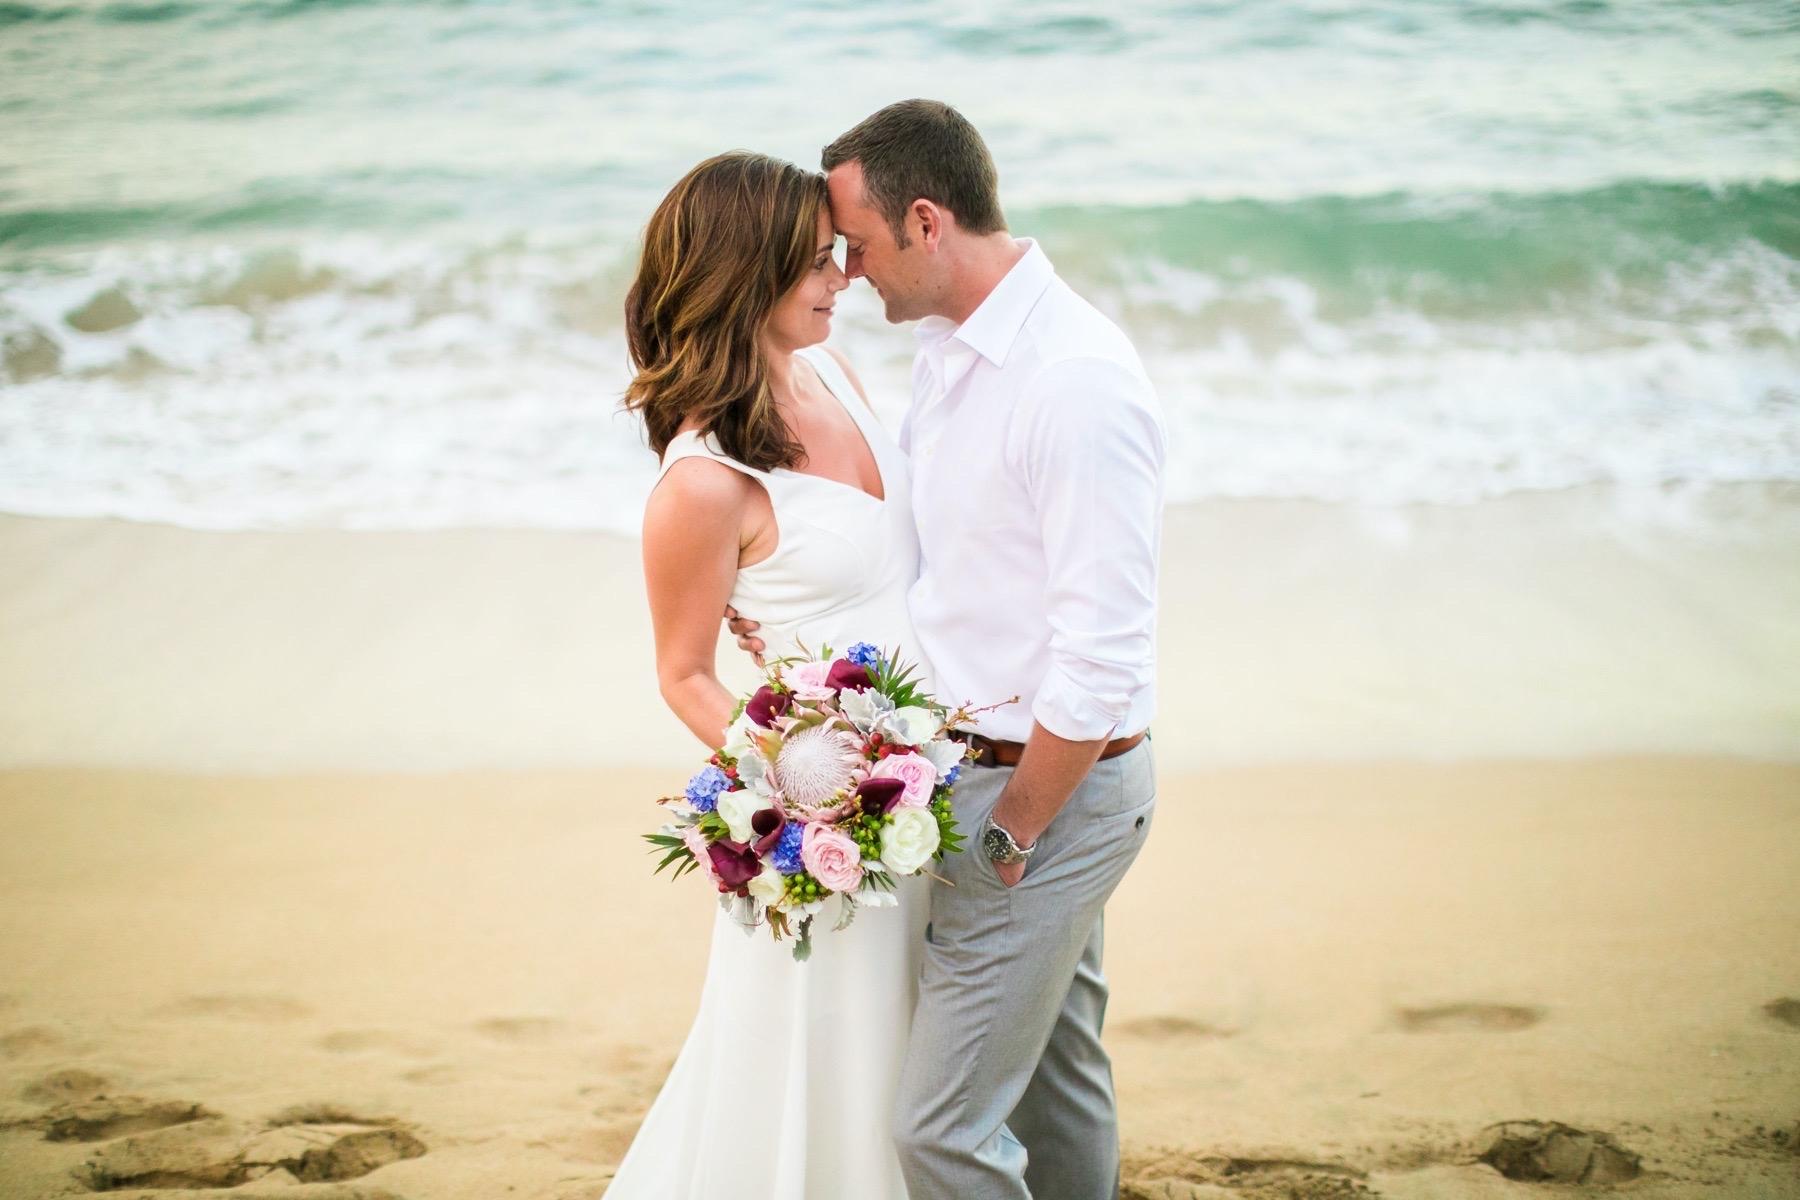 Samantha and Levi eloping in Hawaii.